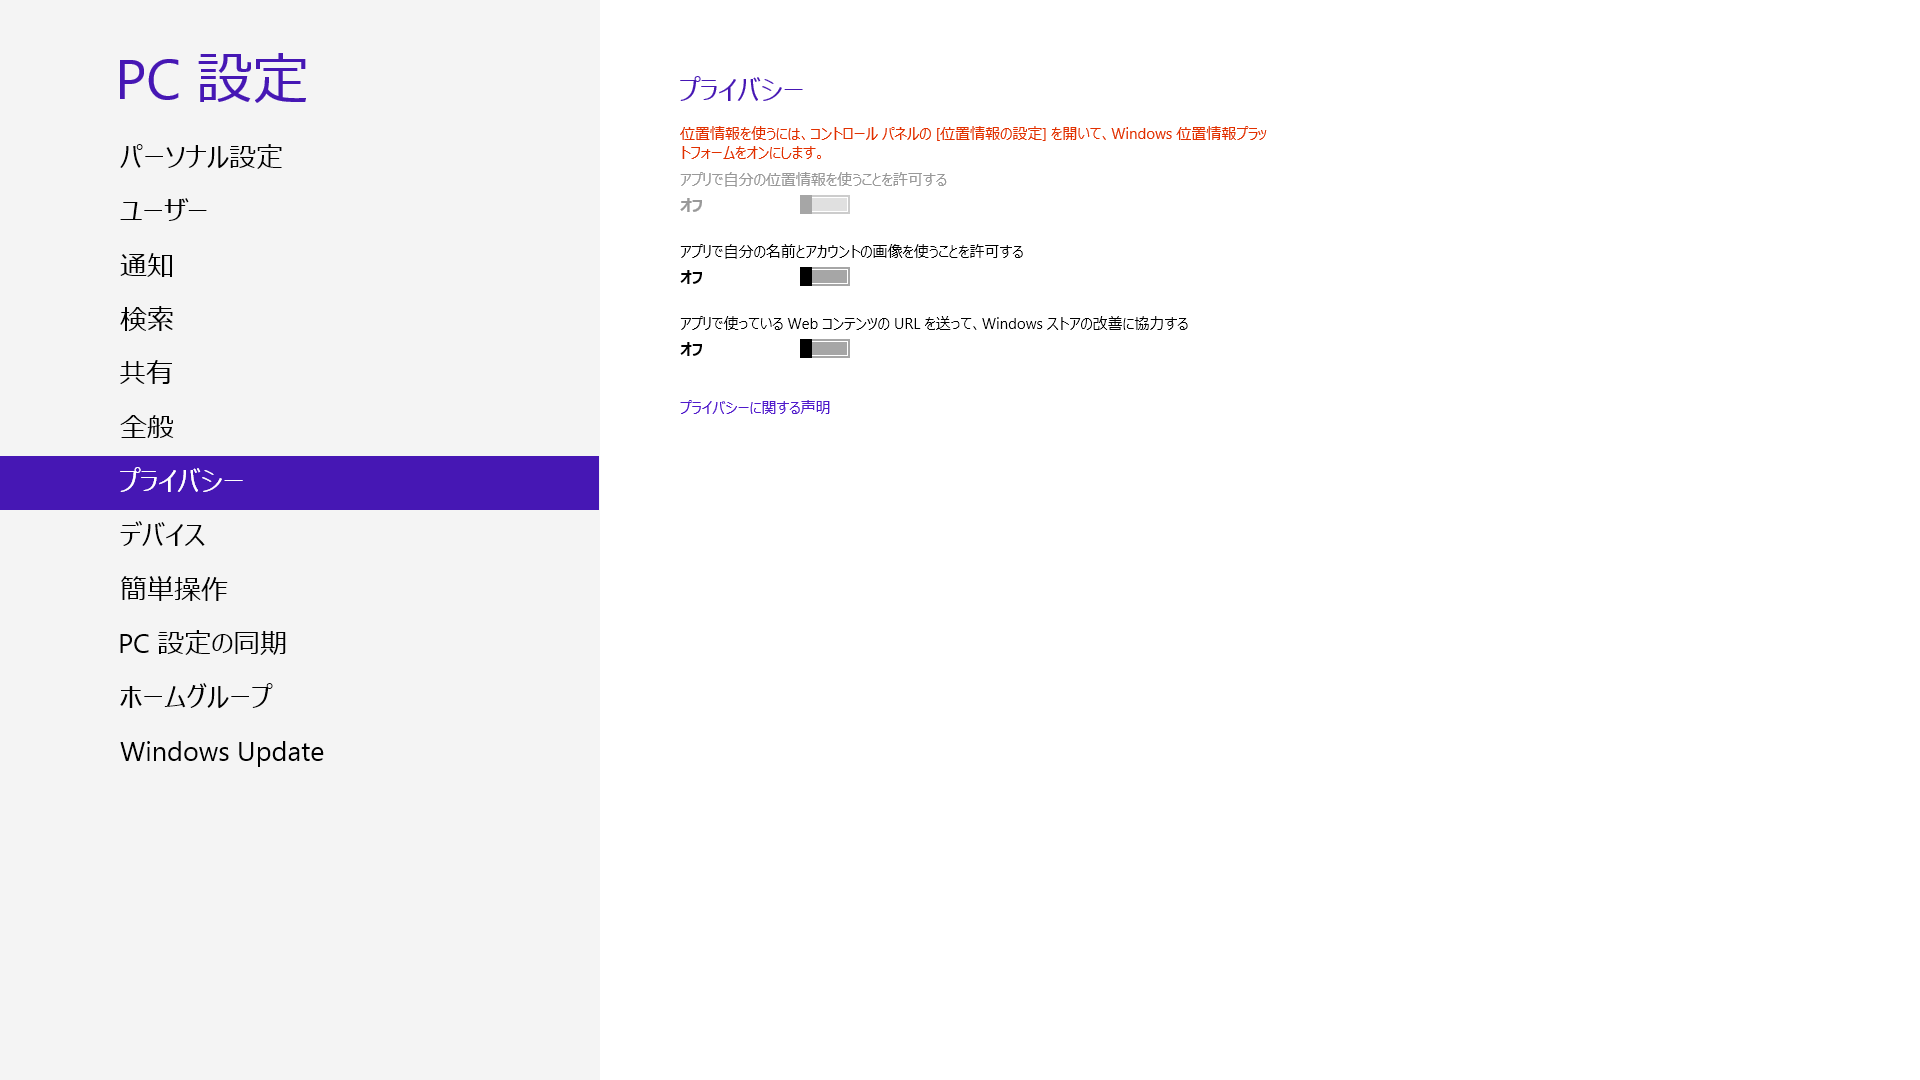 Windows8 プライバシーユーザー設定削除い